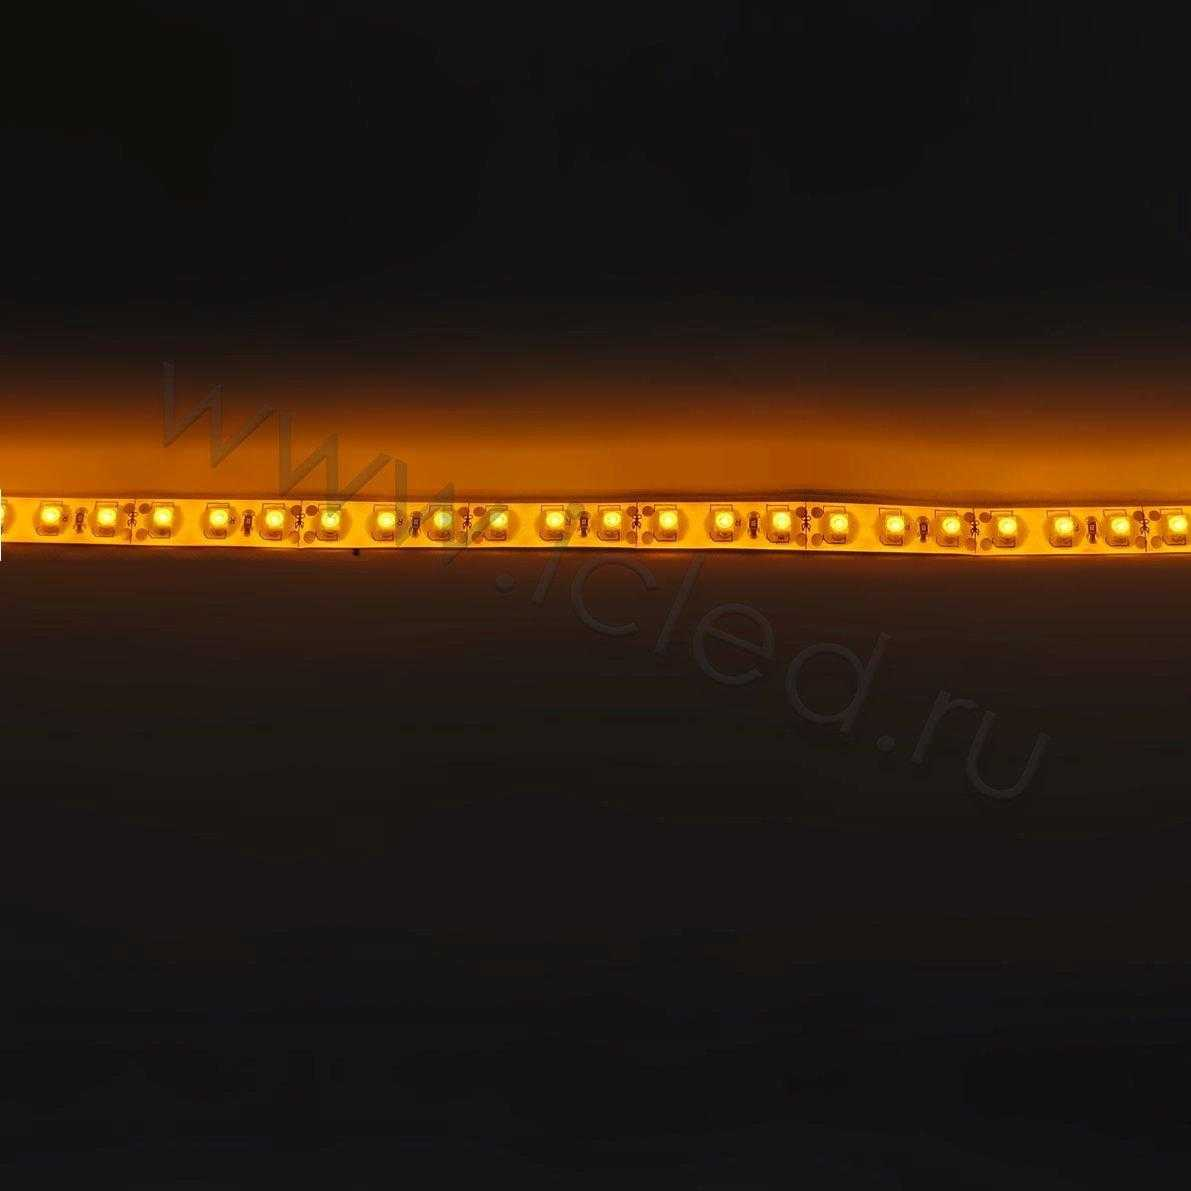 ветодиодная лента Econom class, 3528, 120led/m, Yellow, 12V, IP65